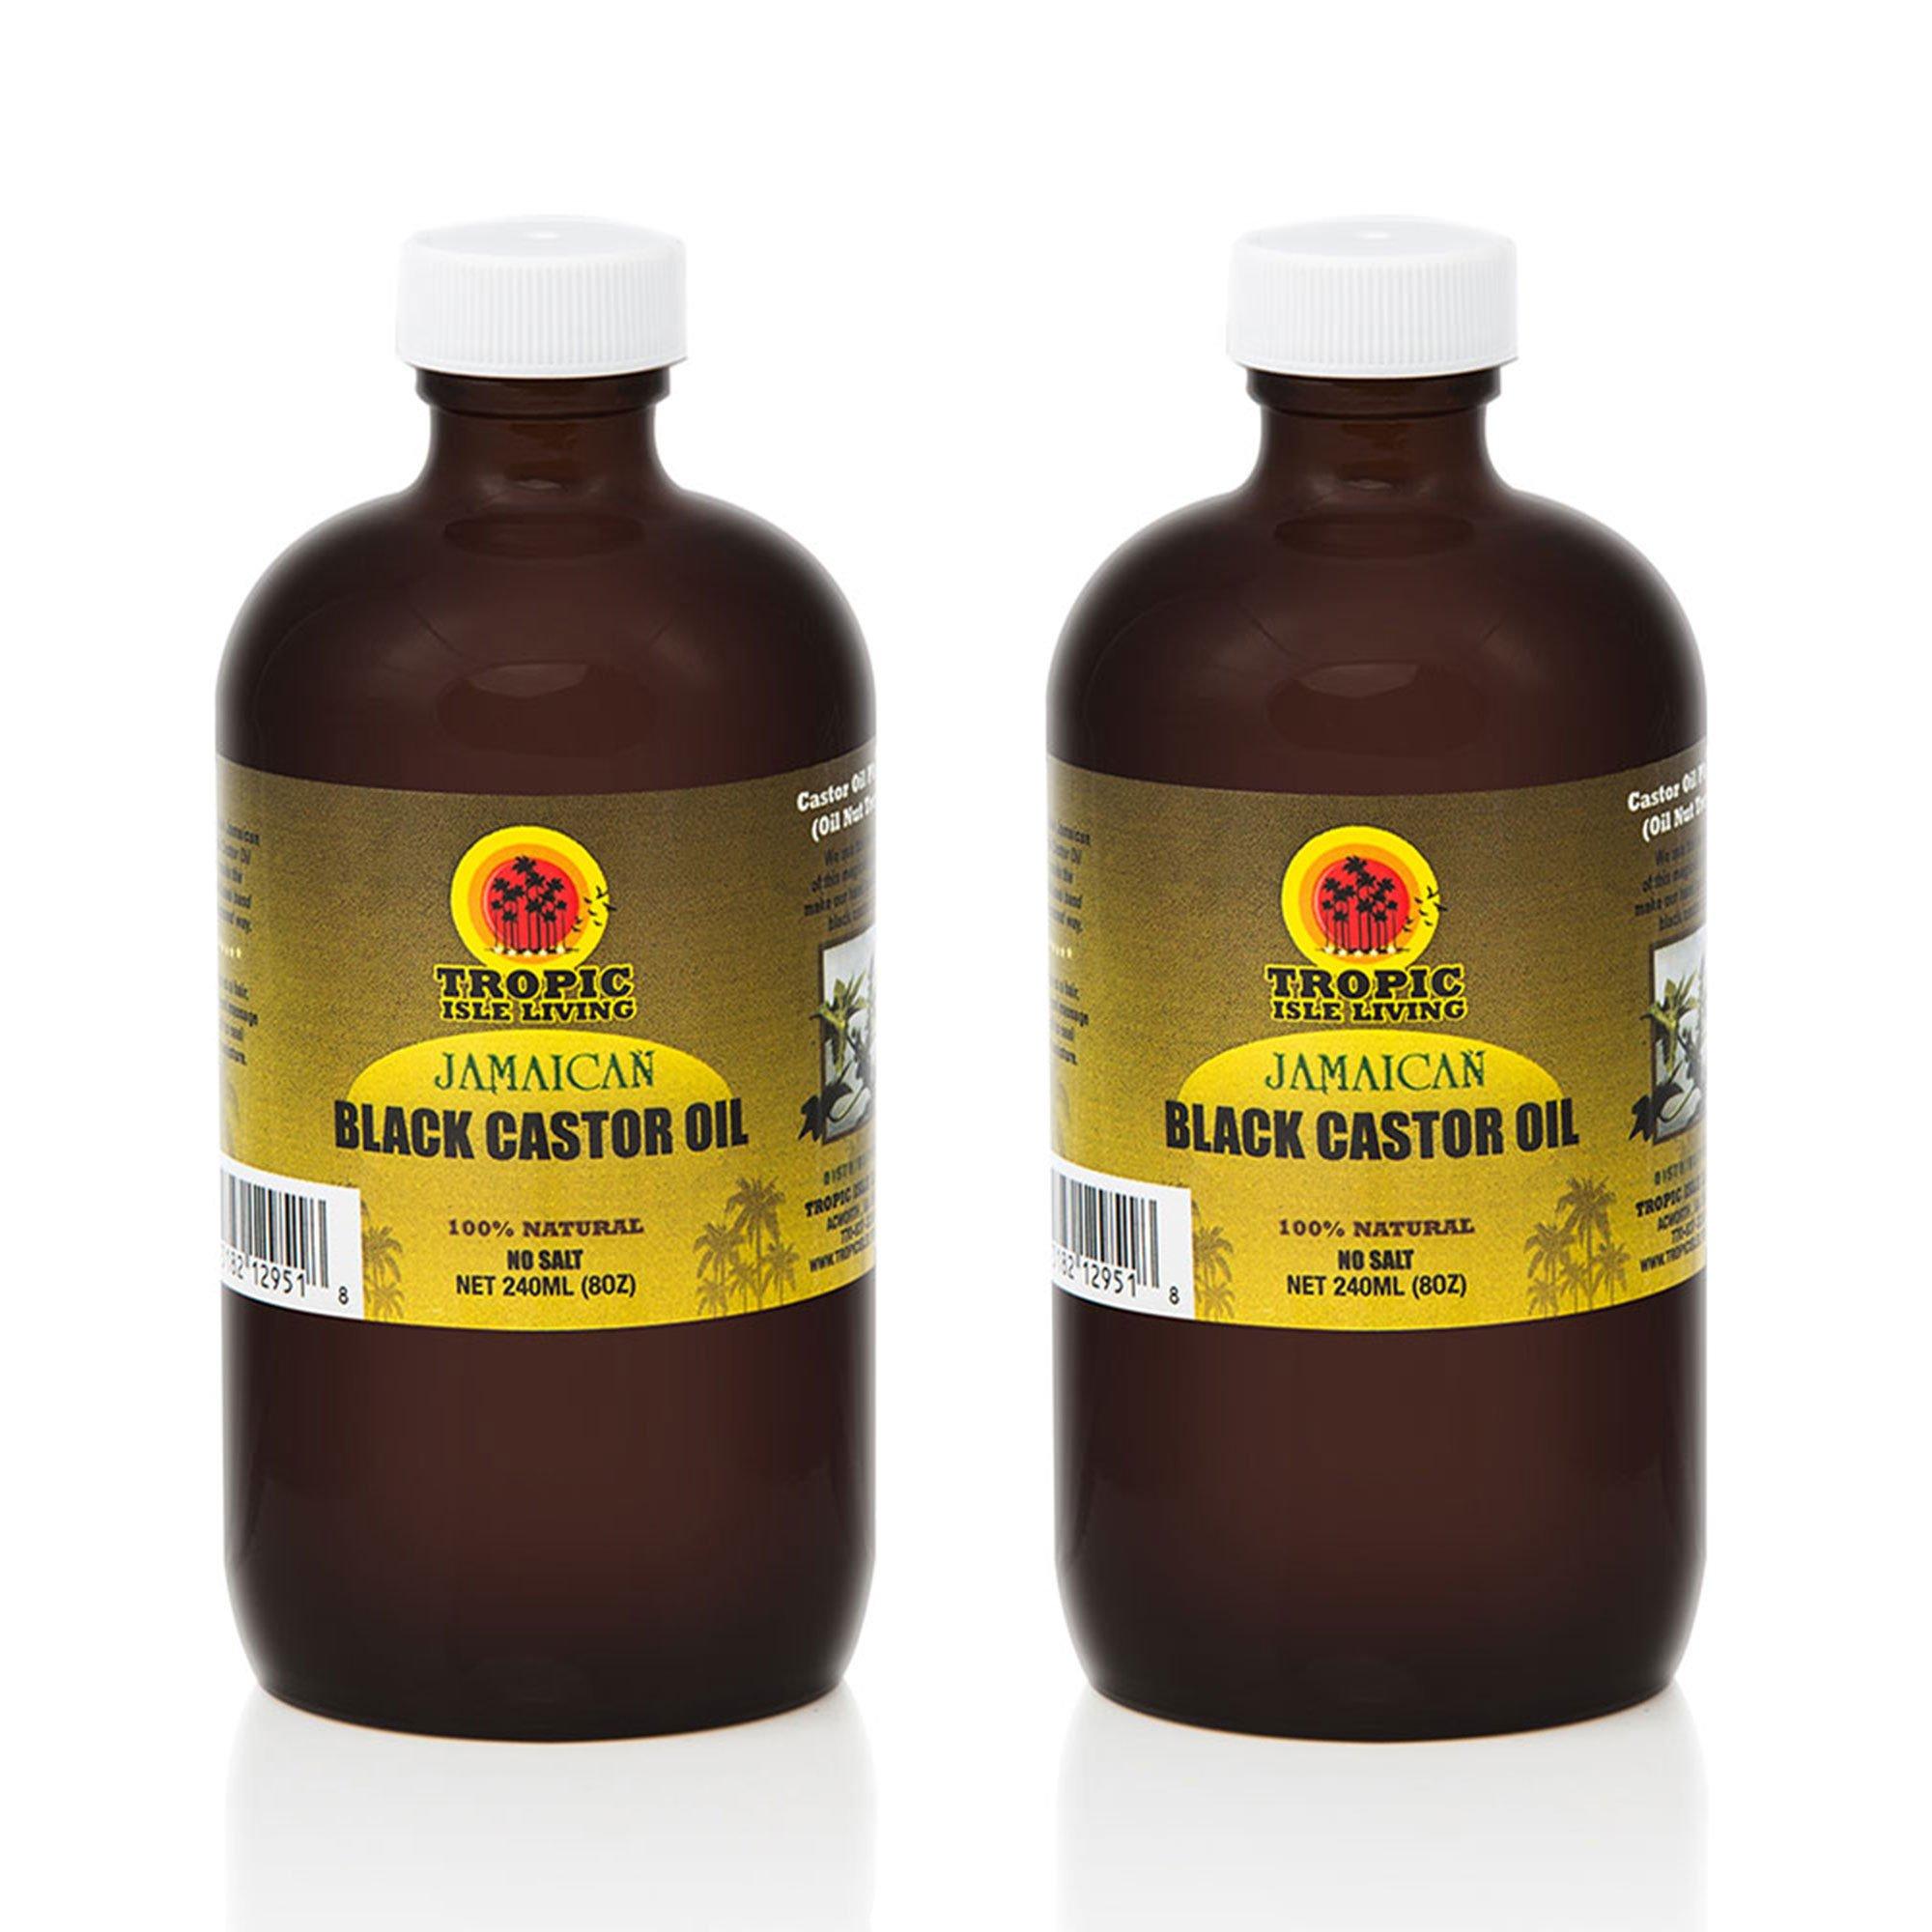 Tropic Isle Living Jamaican Black Castor Oil 8oz Pack of 2 by Tropic Isle Living